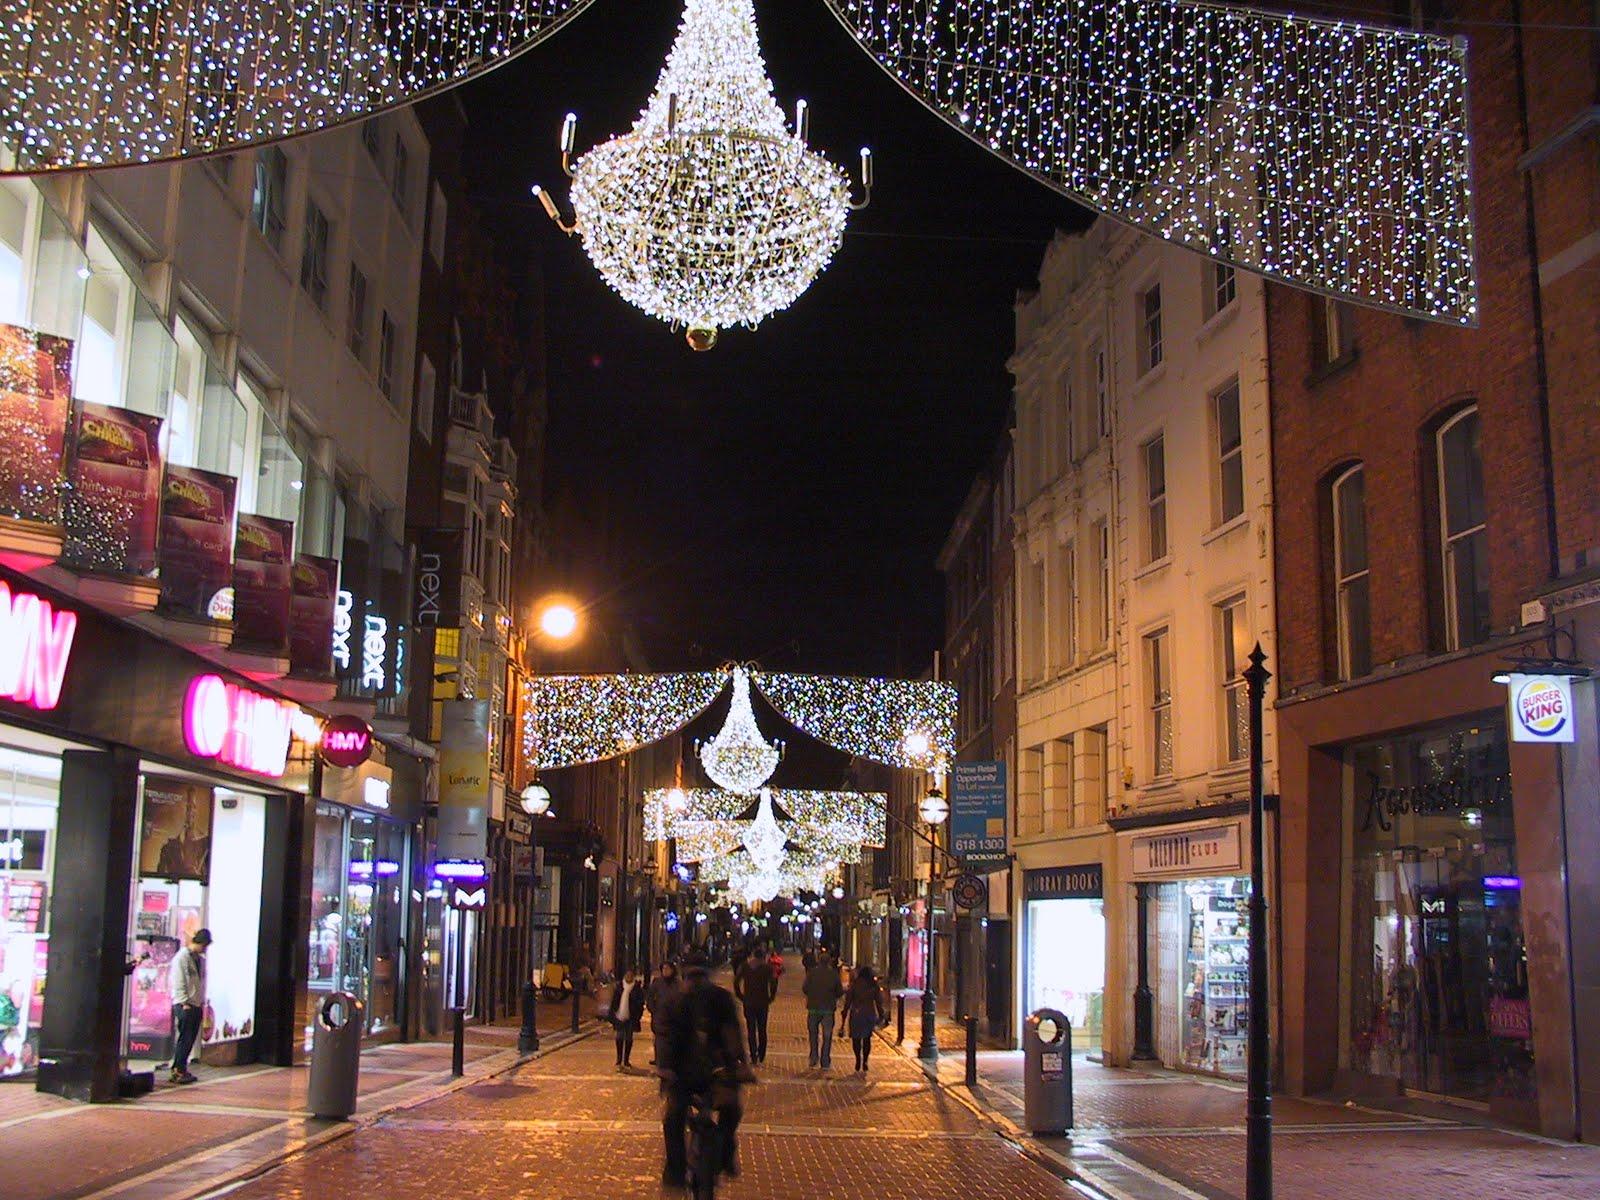 Dublin taxi: Christmas tree all lighted up